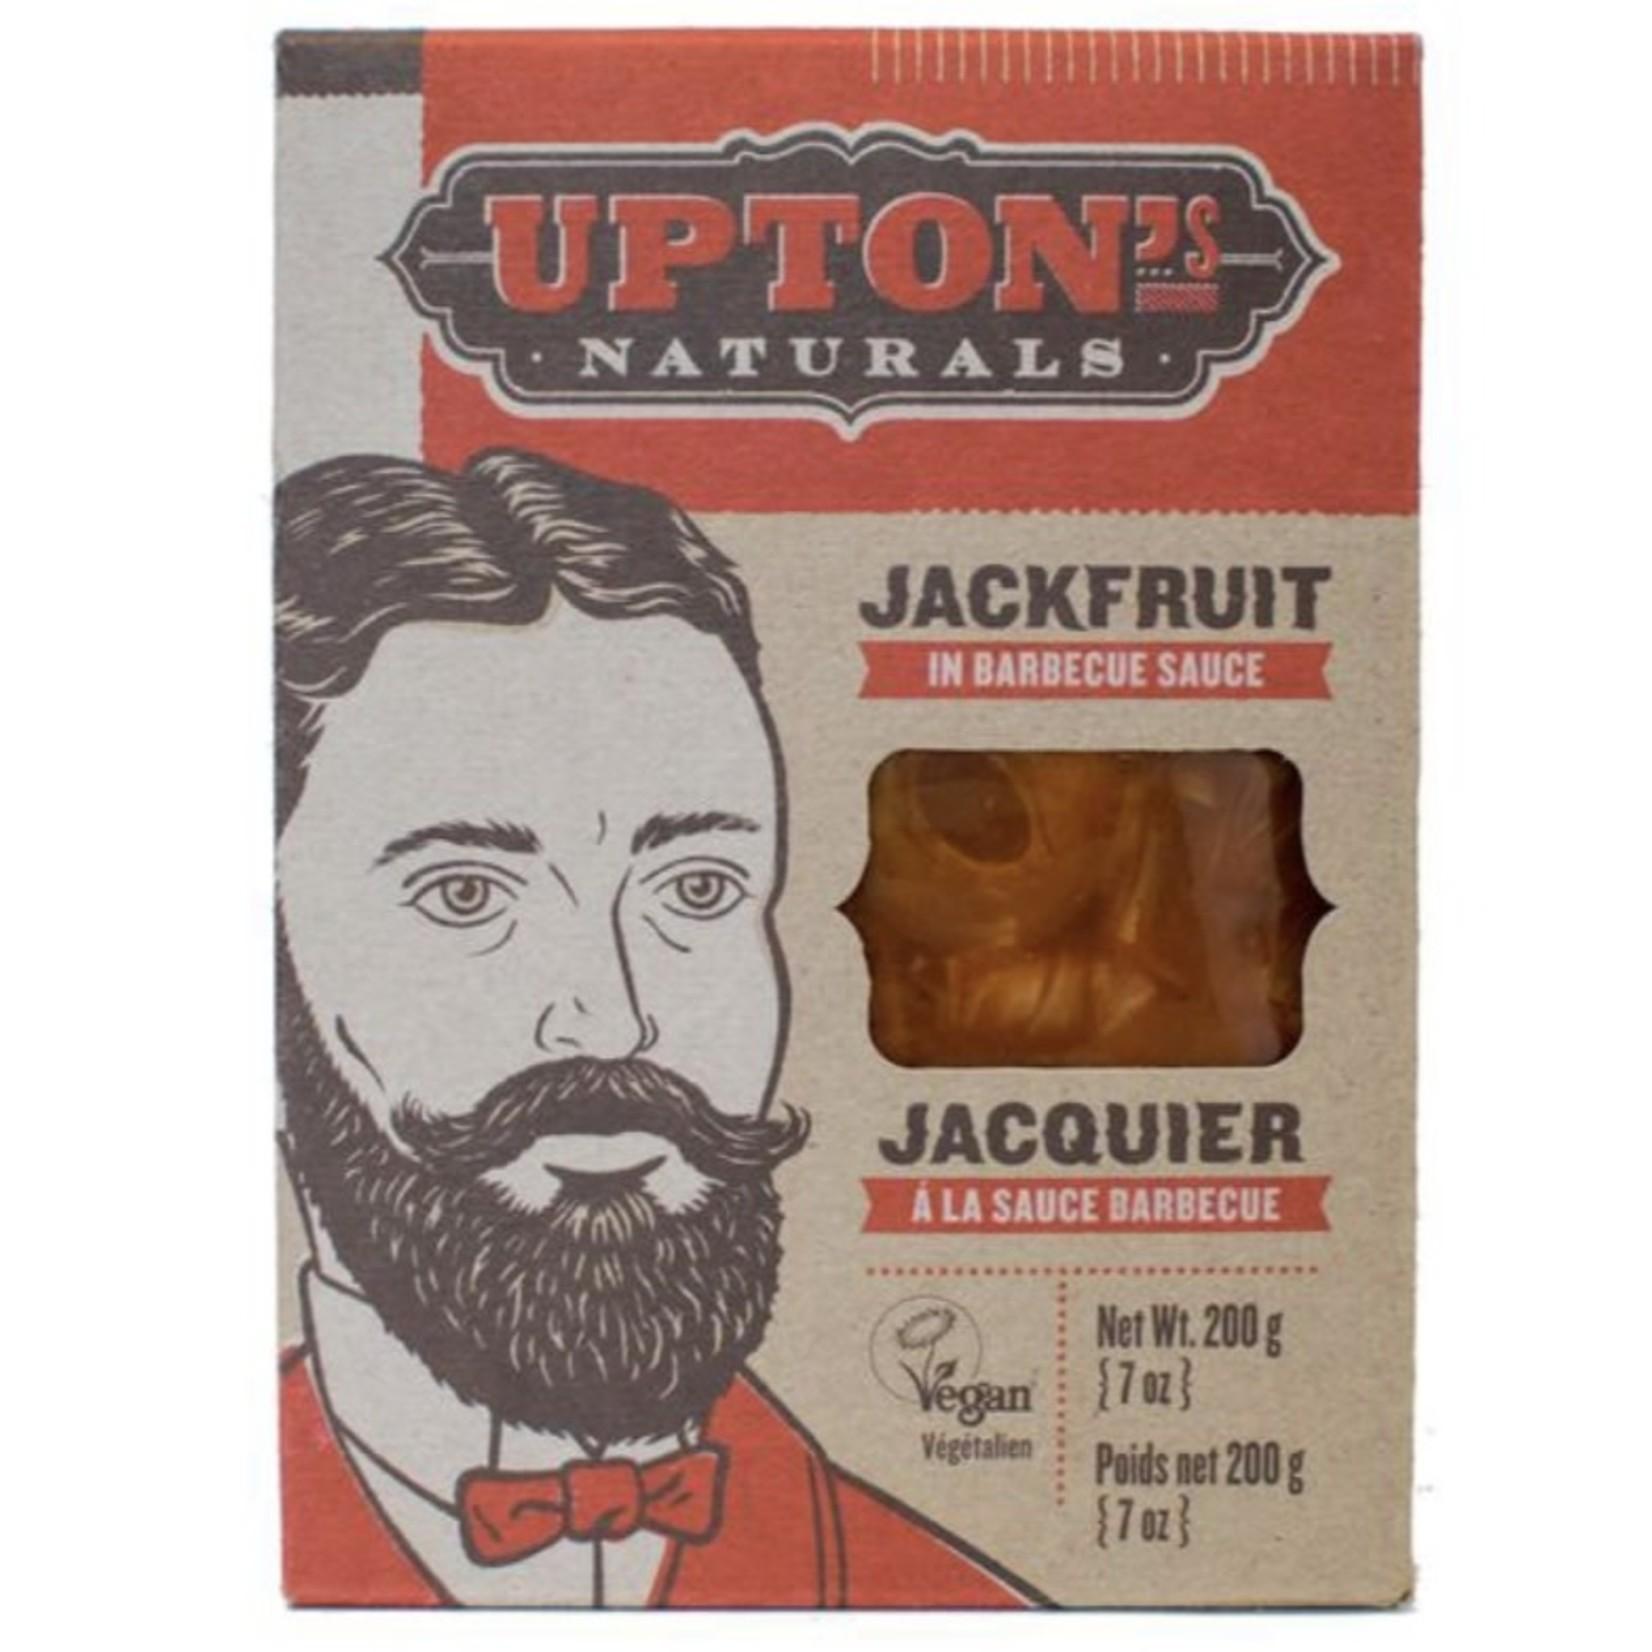 Upton's Upton's Jackfruit in BBQ Sauce